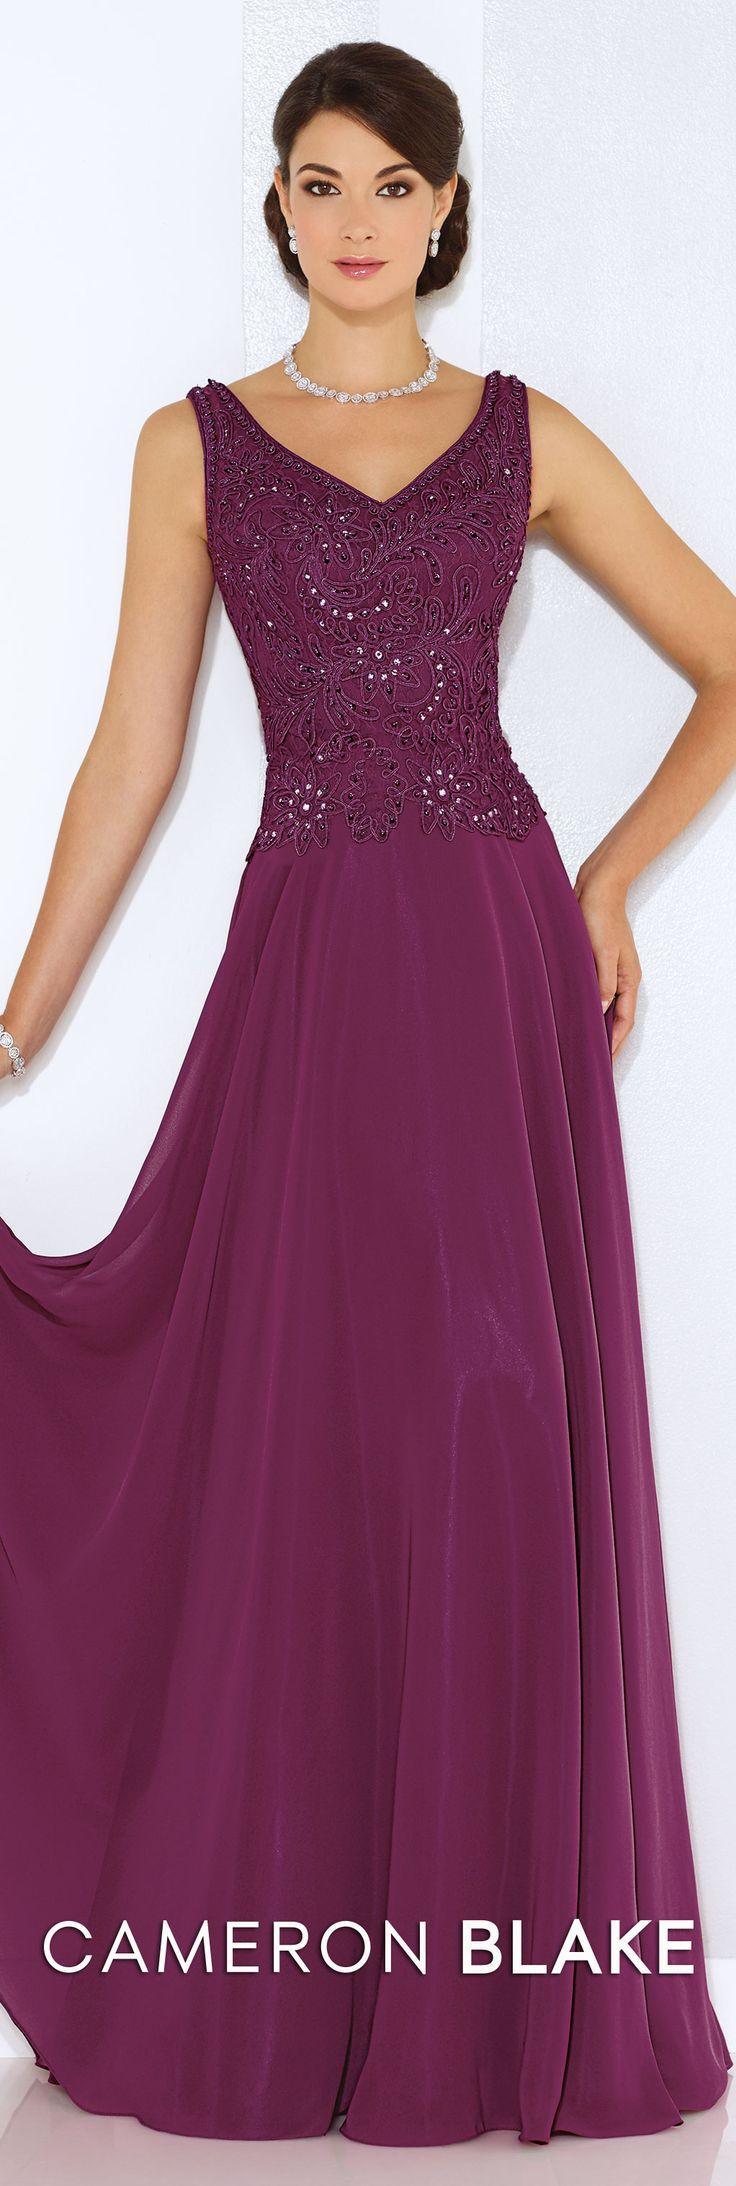 Cameron Blake Spring 2016 - Style No. 116654 #formaleveningdresses  Elizabeth Classic Necklace and Elizabeth Earrings www.davidtuteraembellish.com